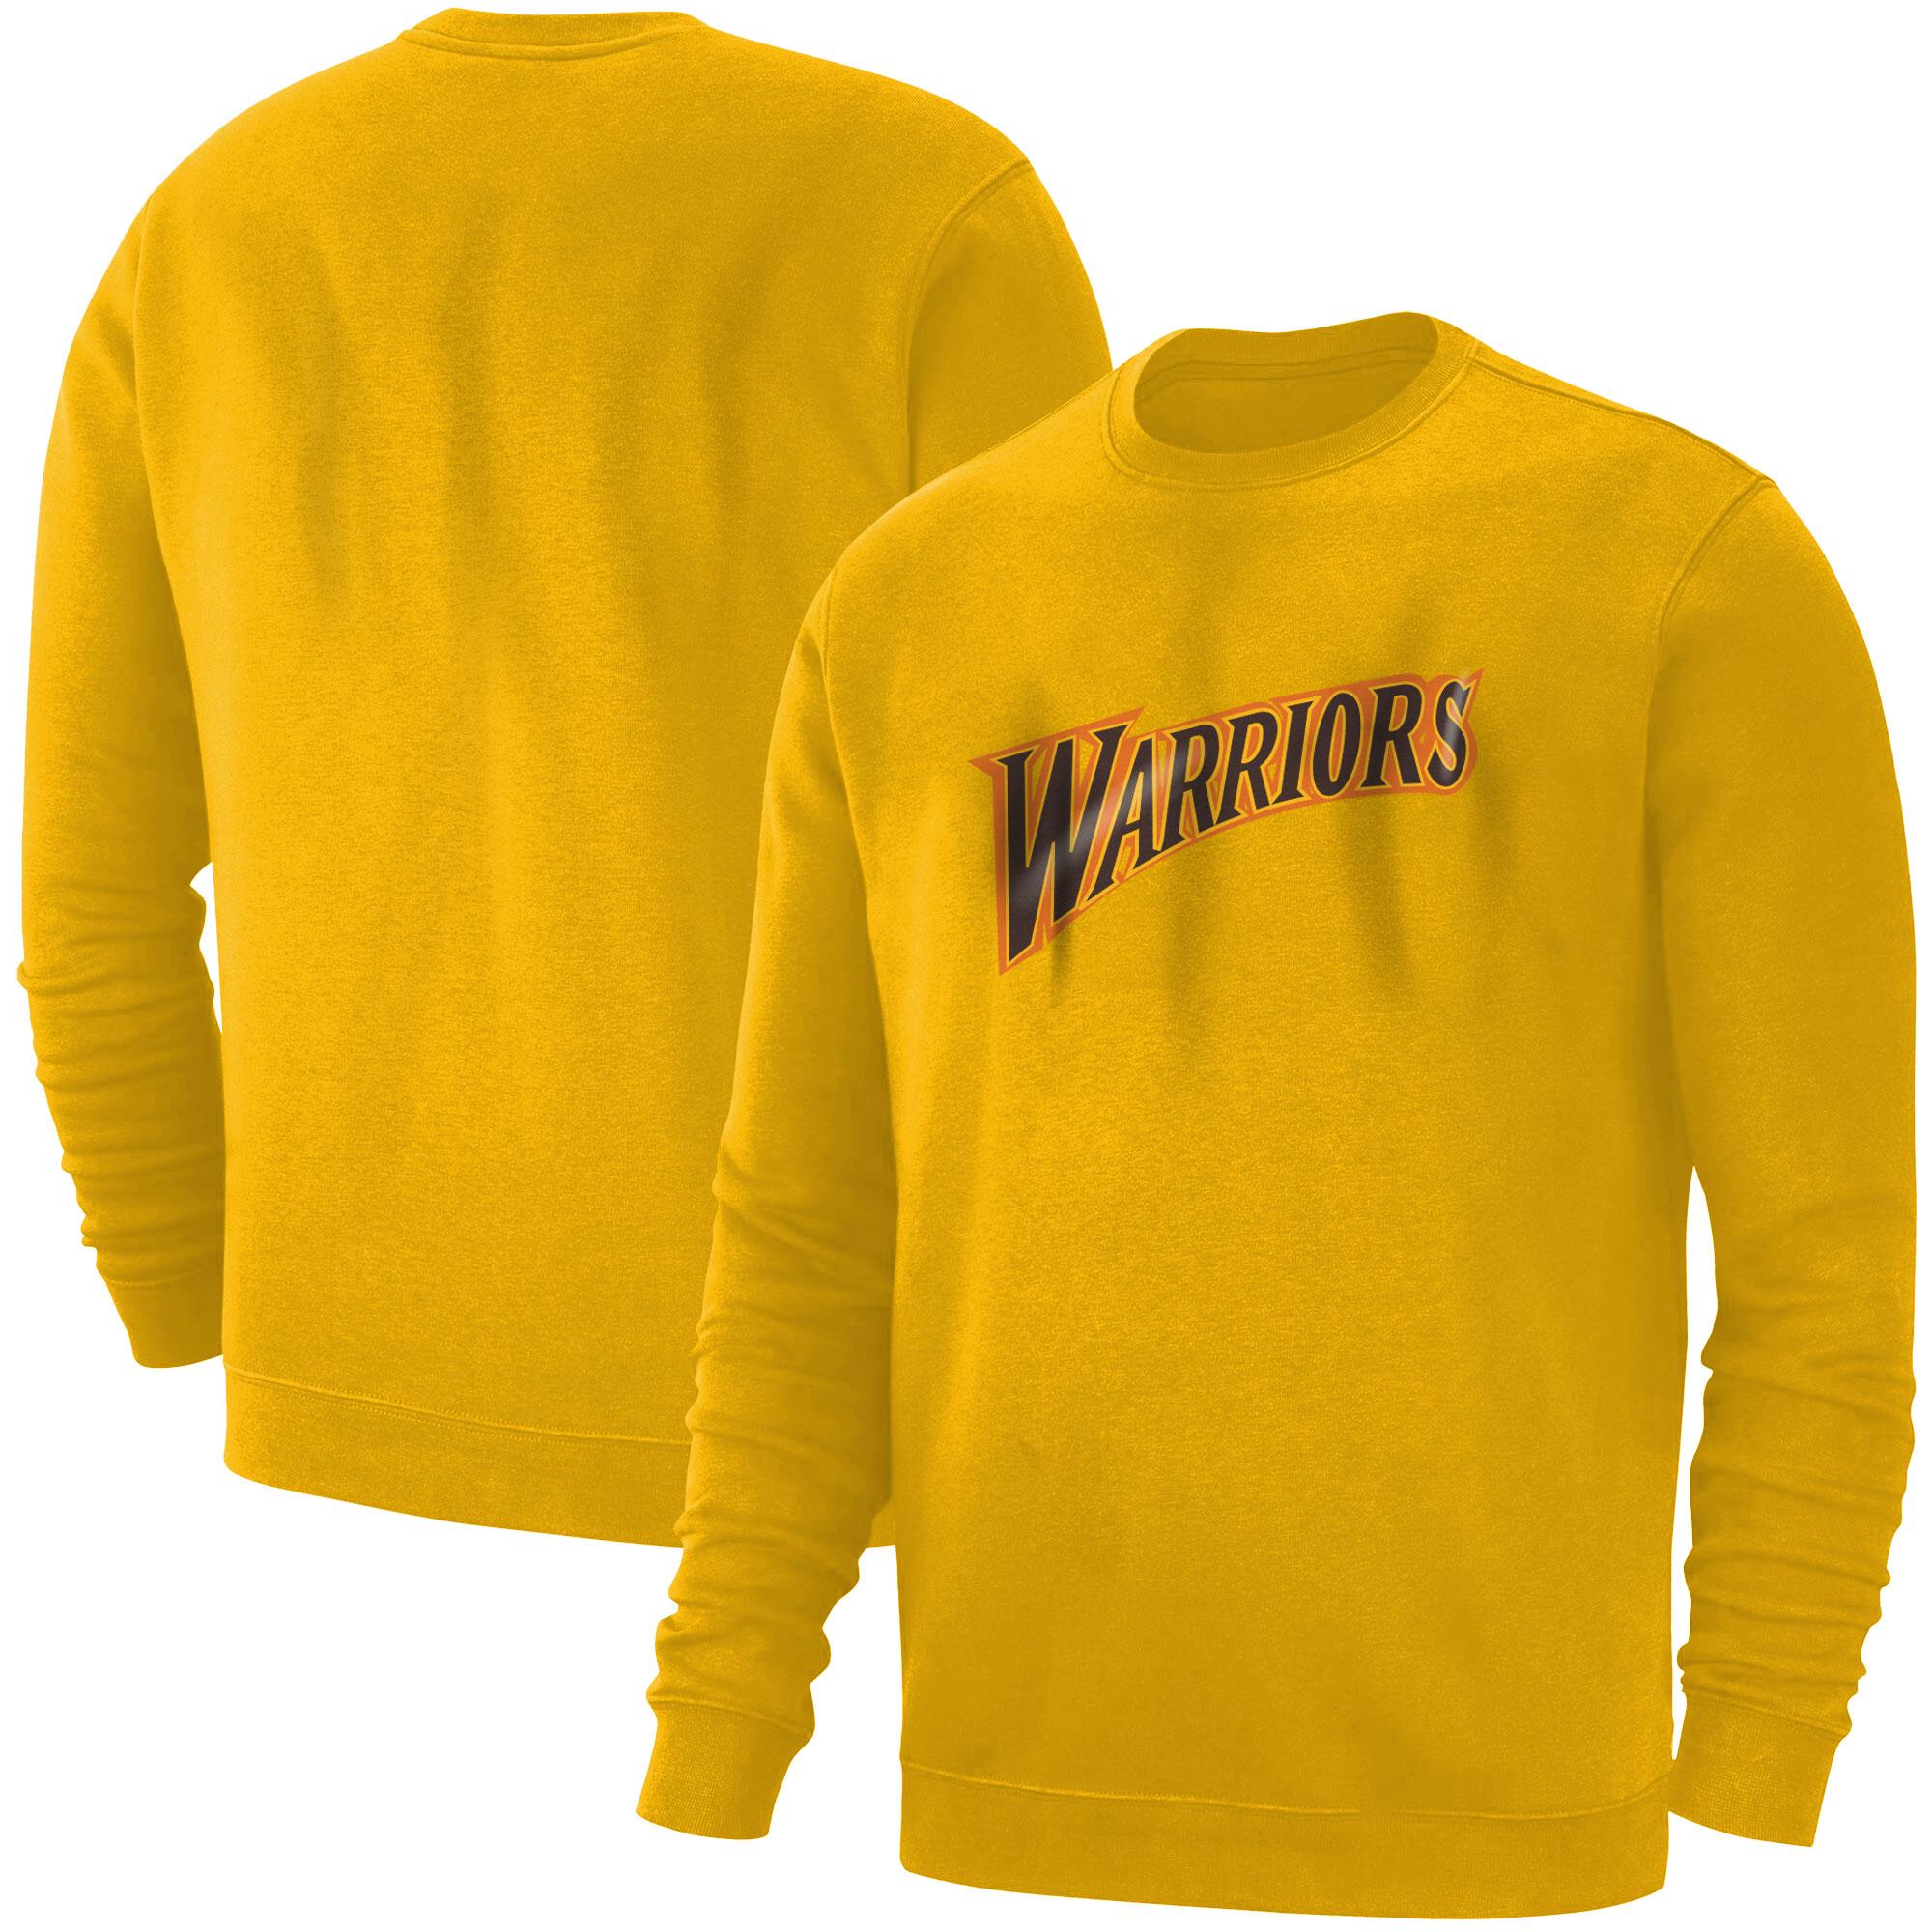 Golden State Warriors Basic (BSC-YLW-482-NBA-GSW)